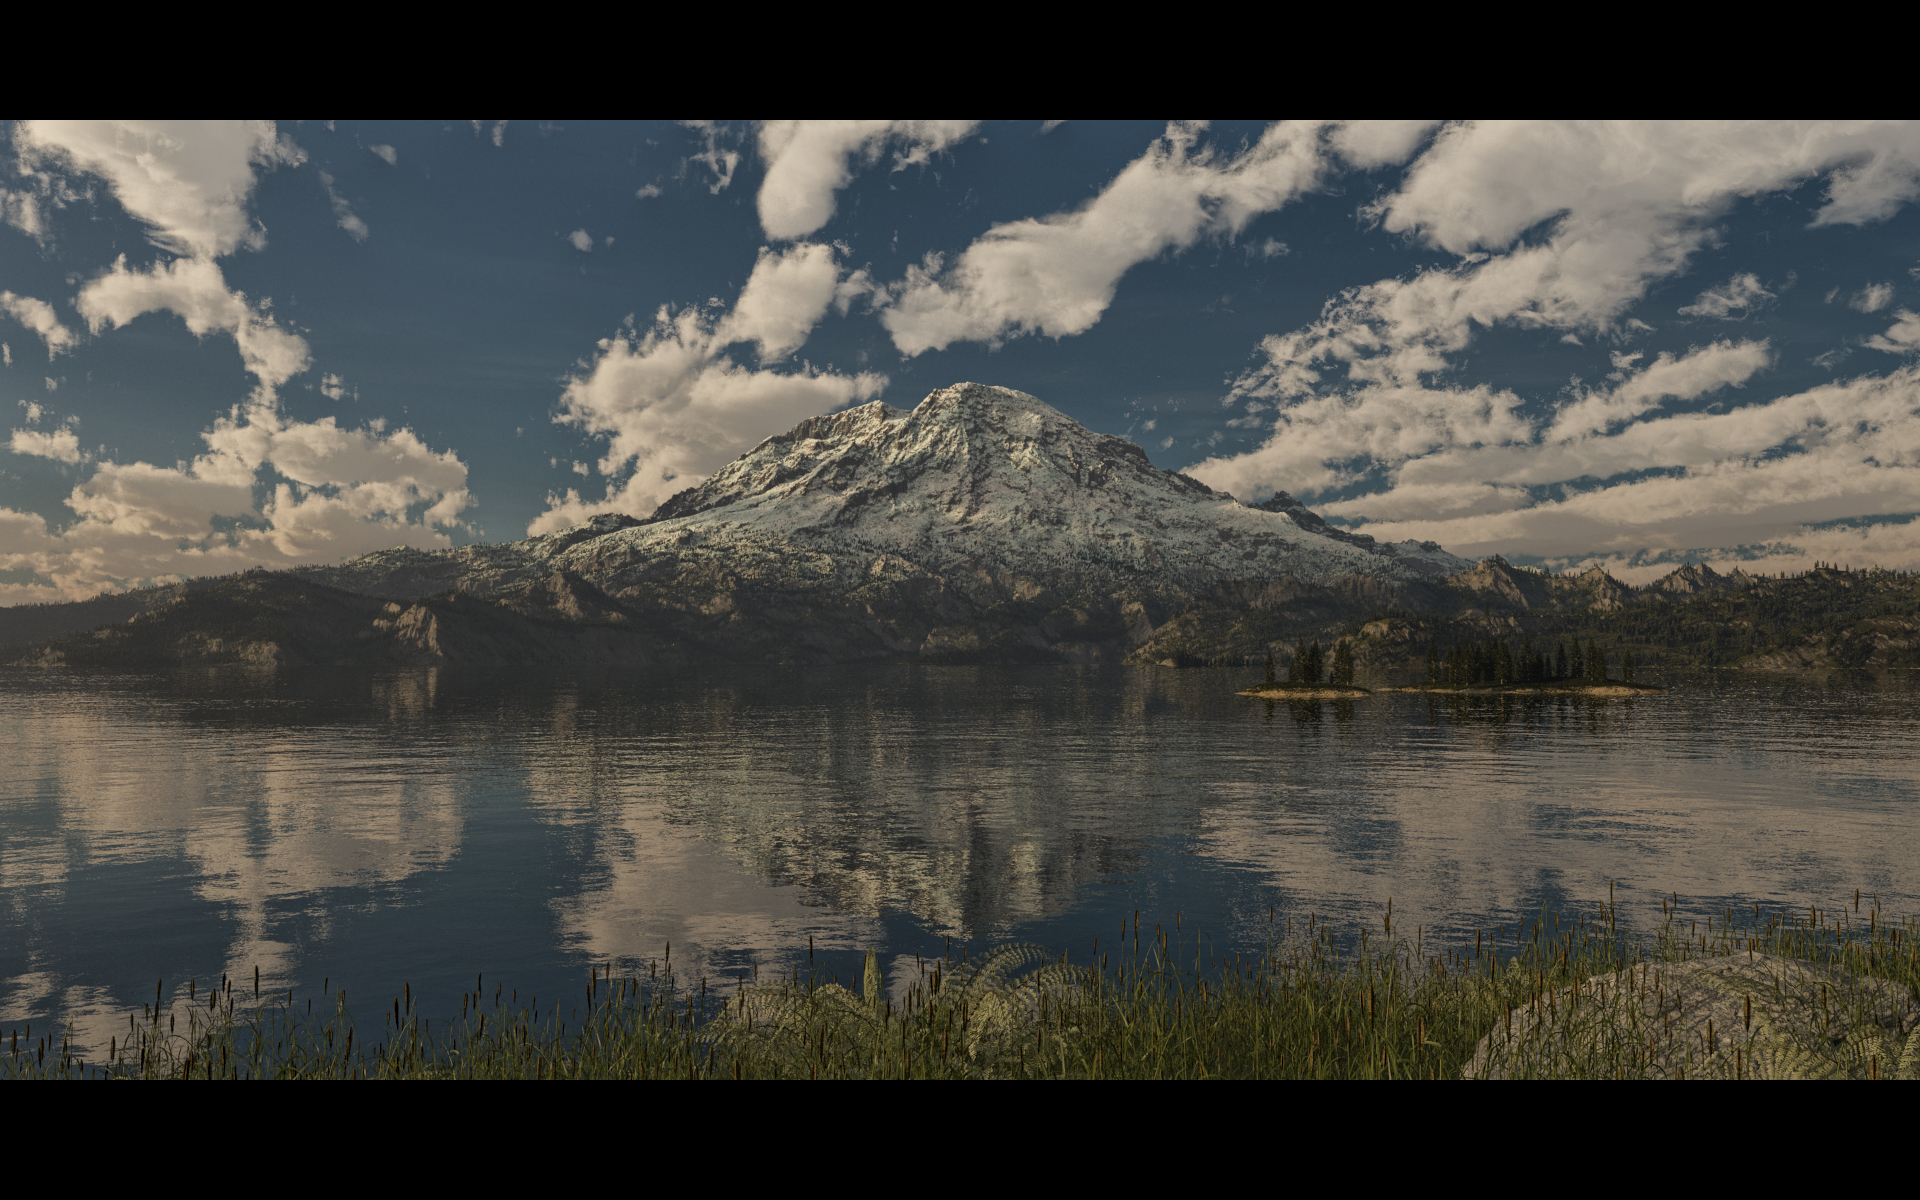 Mt. Rainier by SwissAdA